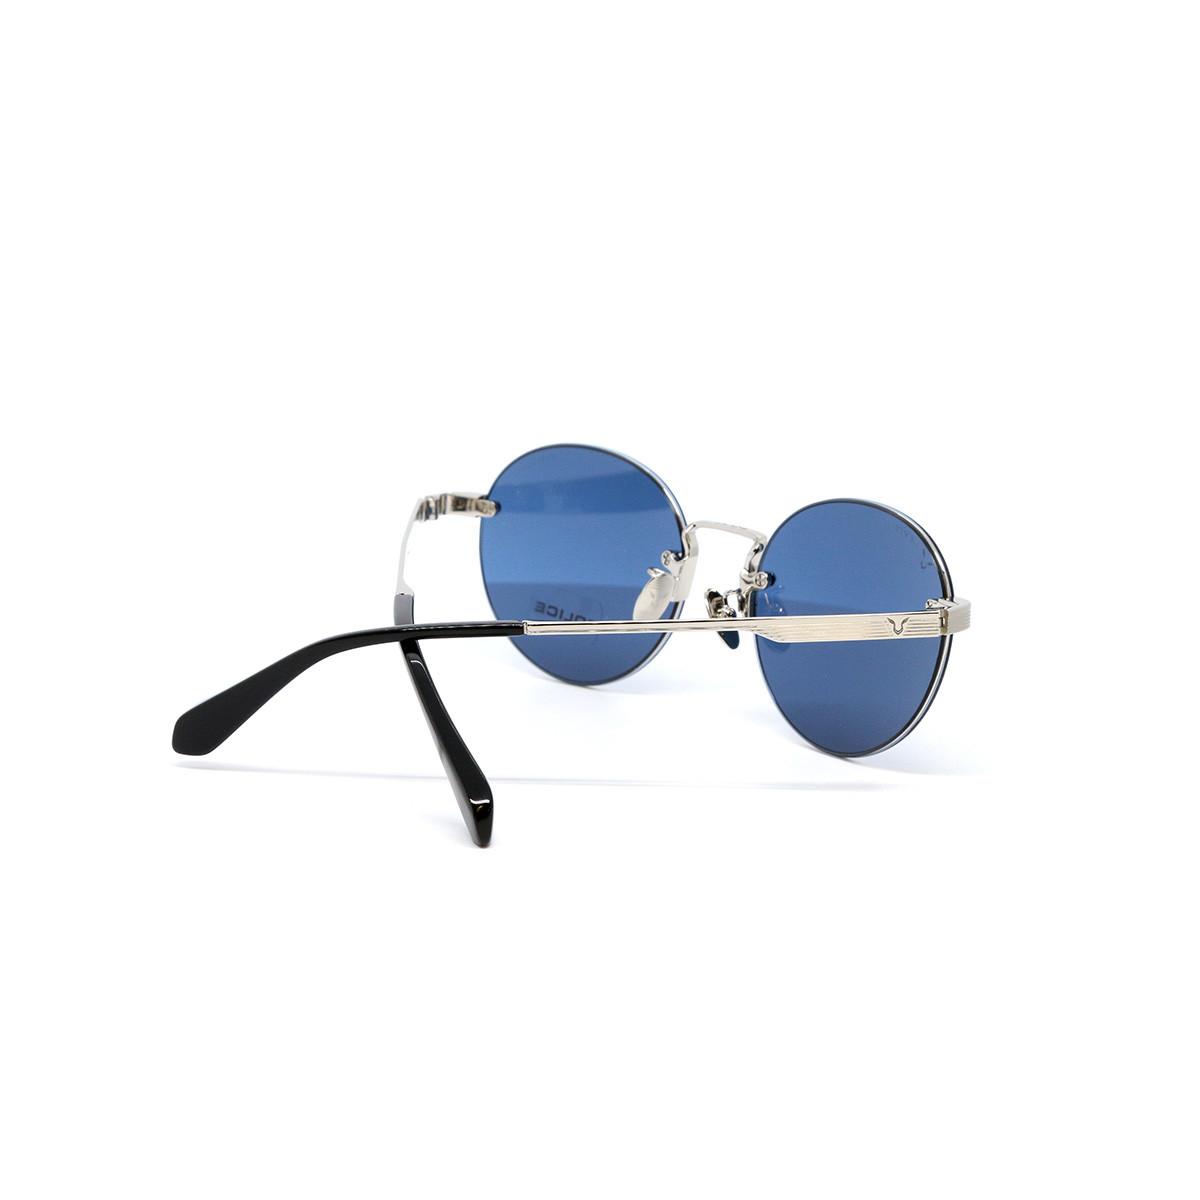 Солнцезащитные очки Police SPLB27M 0579 53 Фото №3 - linza.com.ua